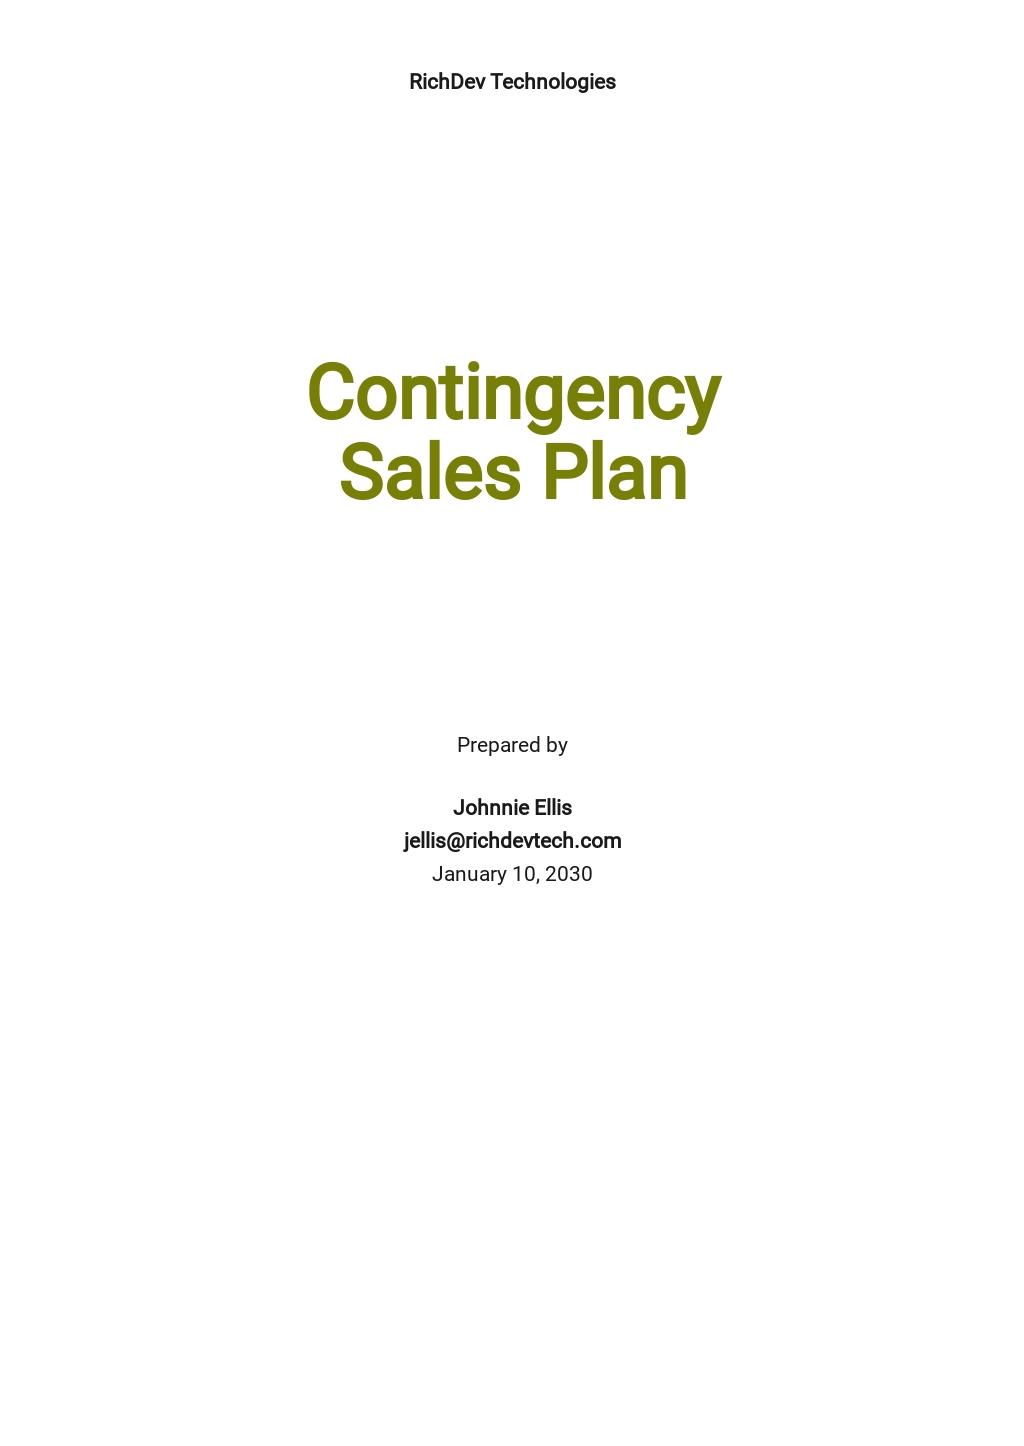 Contingency Sales Plan Template